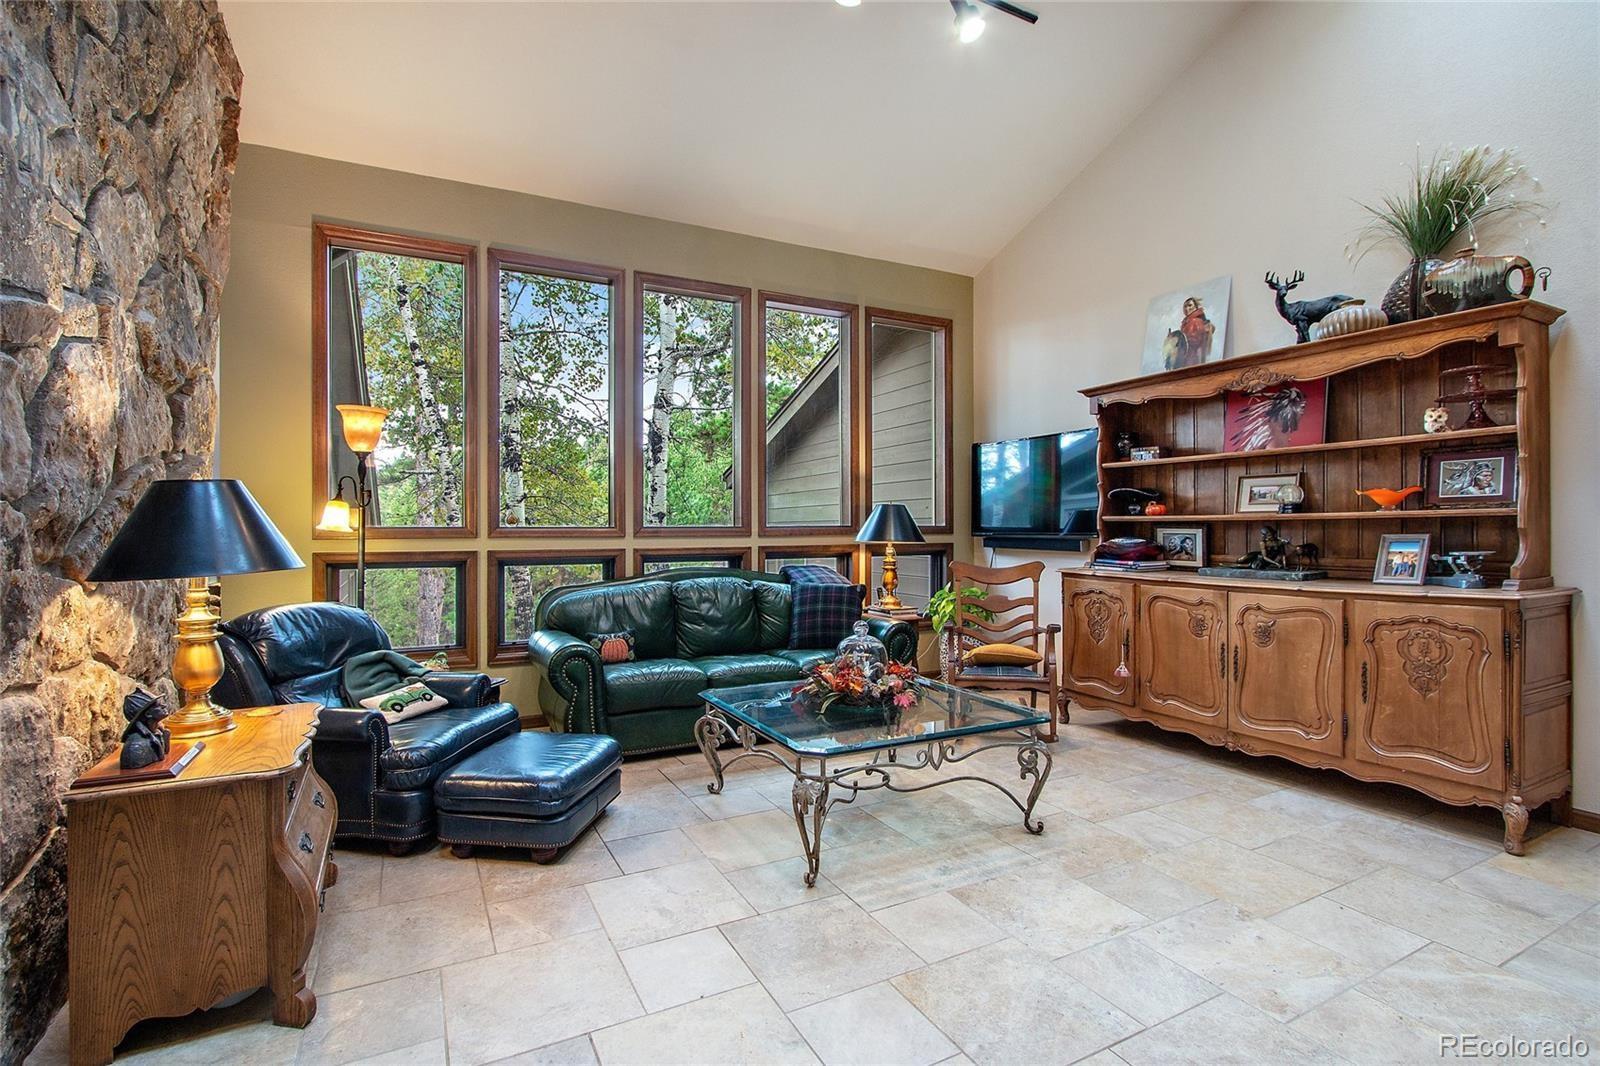 MLS# 1902527 - 6 - 29080 Pinewood Vista Drive, Evergreen, CO 80439